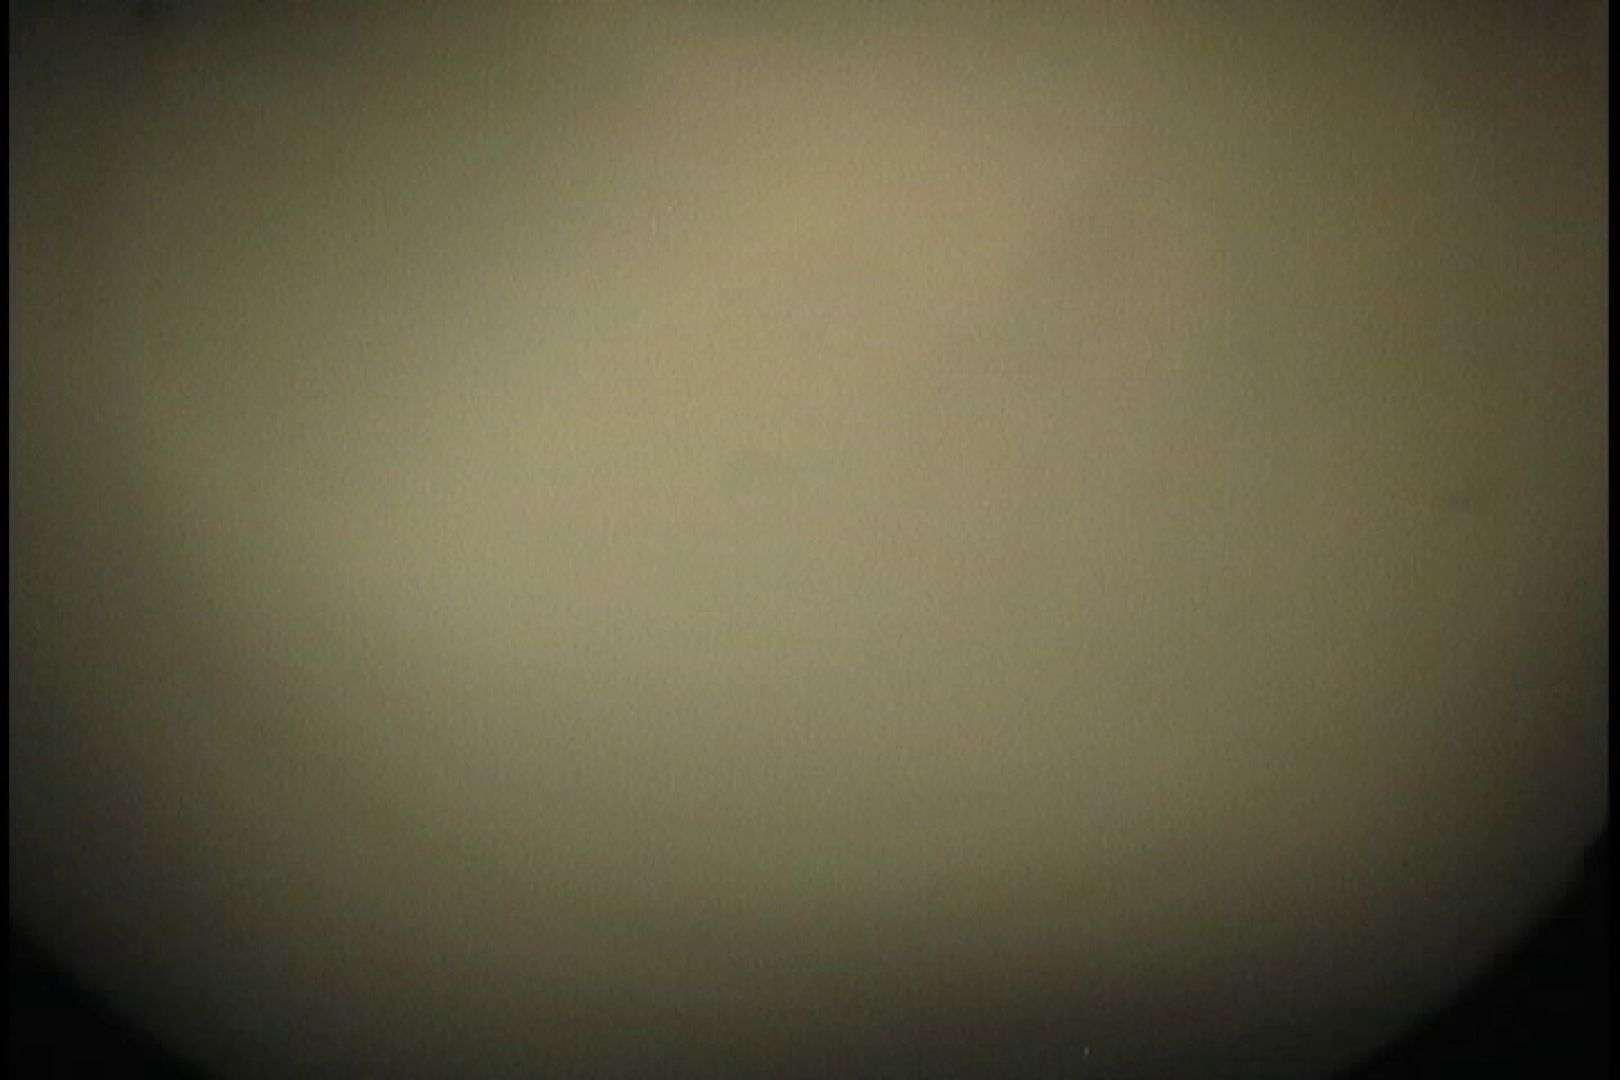 No.32 脇とVラインの処理が甘い貧乳ギャル、タンポンの紐がぶらぶら シャワー室 | 乙女H映像  88画像 18